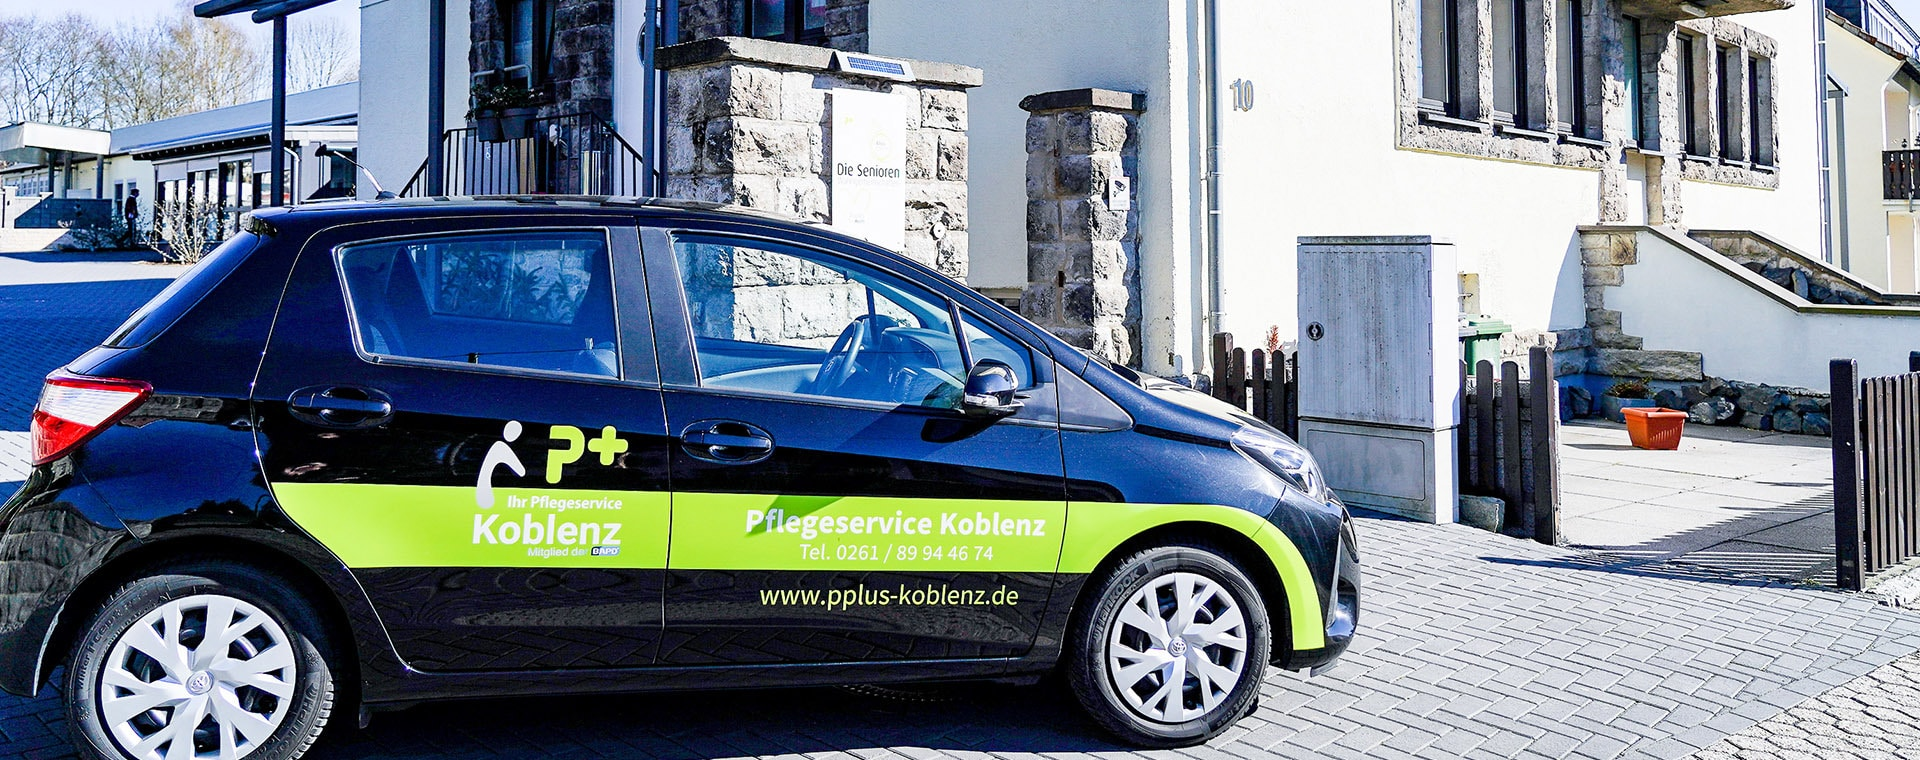 Auto Pflegeservice Koblenz